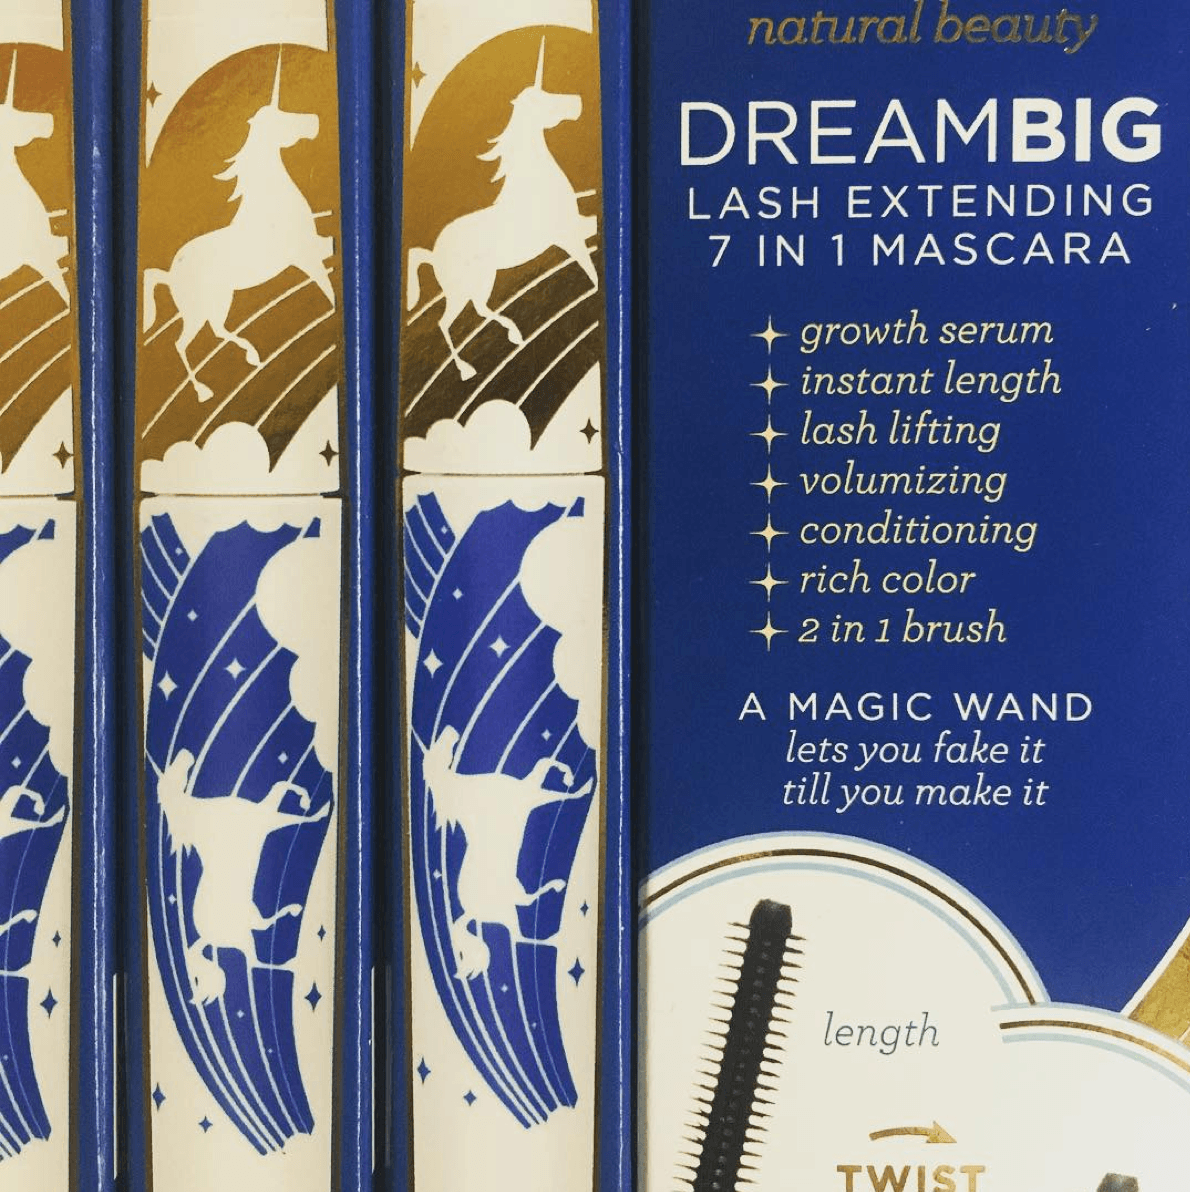 Pacifica Dream Big Lash Extending 7 in 1 Mascara